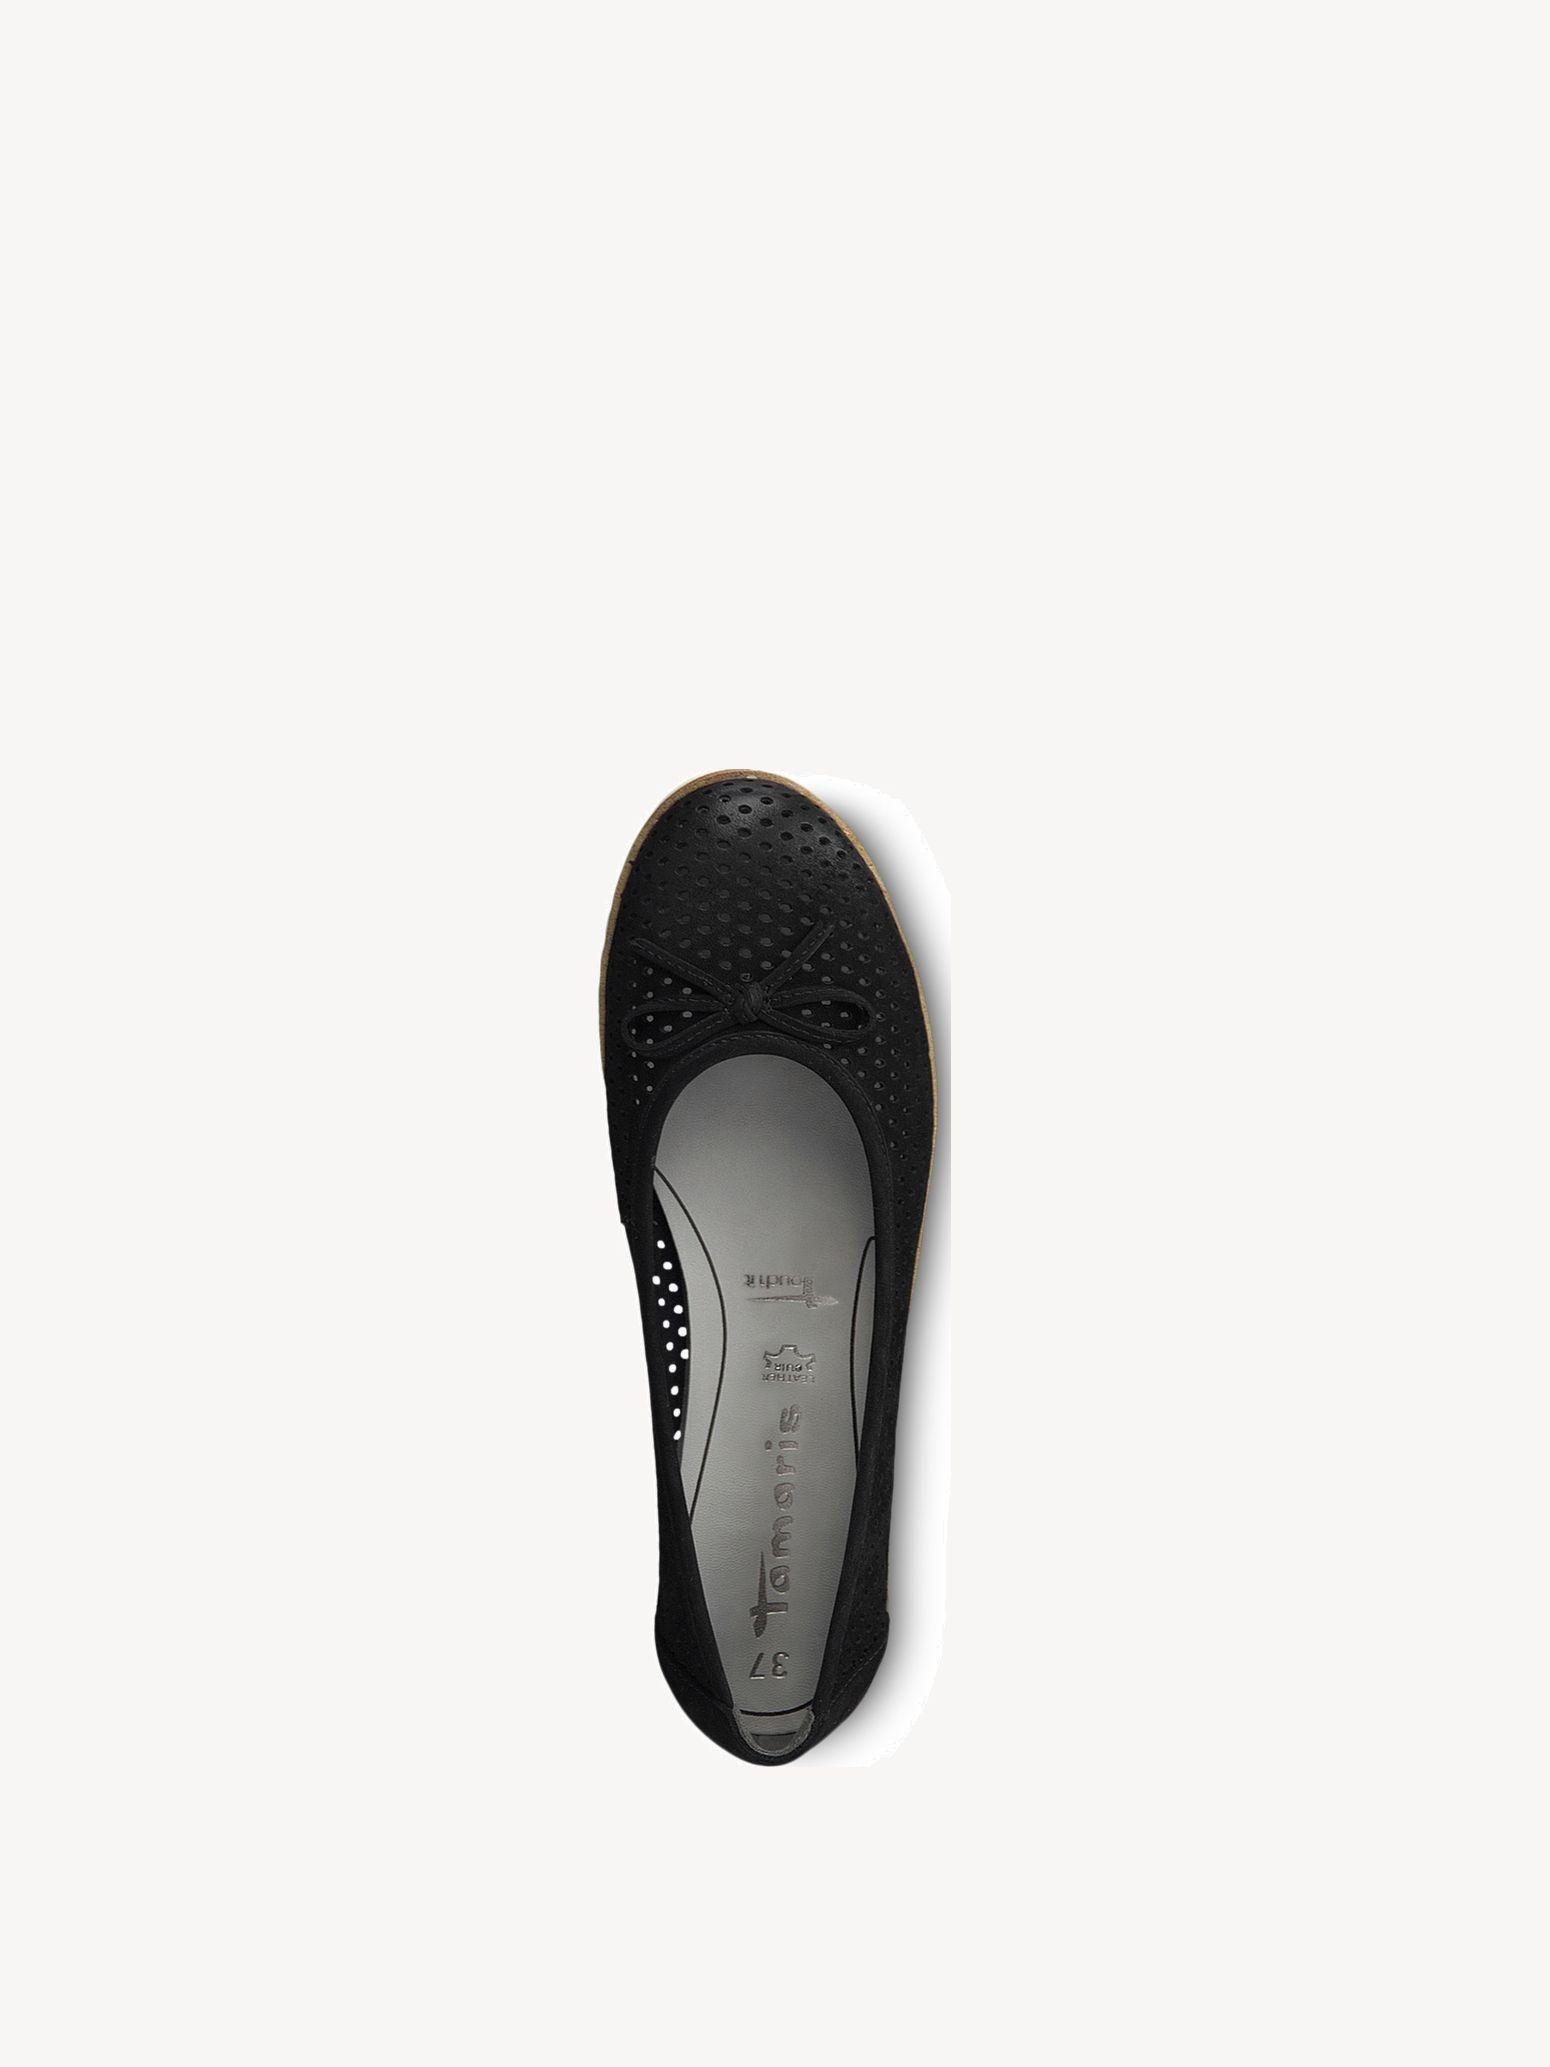 Acheter des chaussures d'origine TAMARIS Ballerines Noir